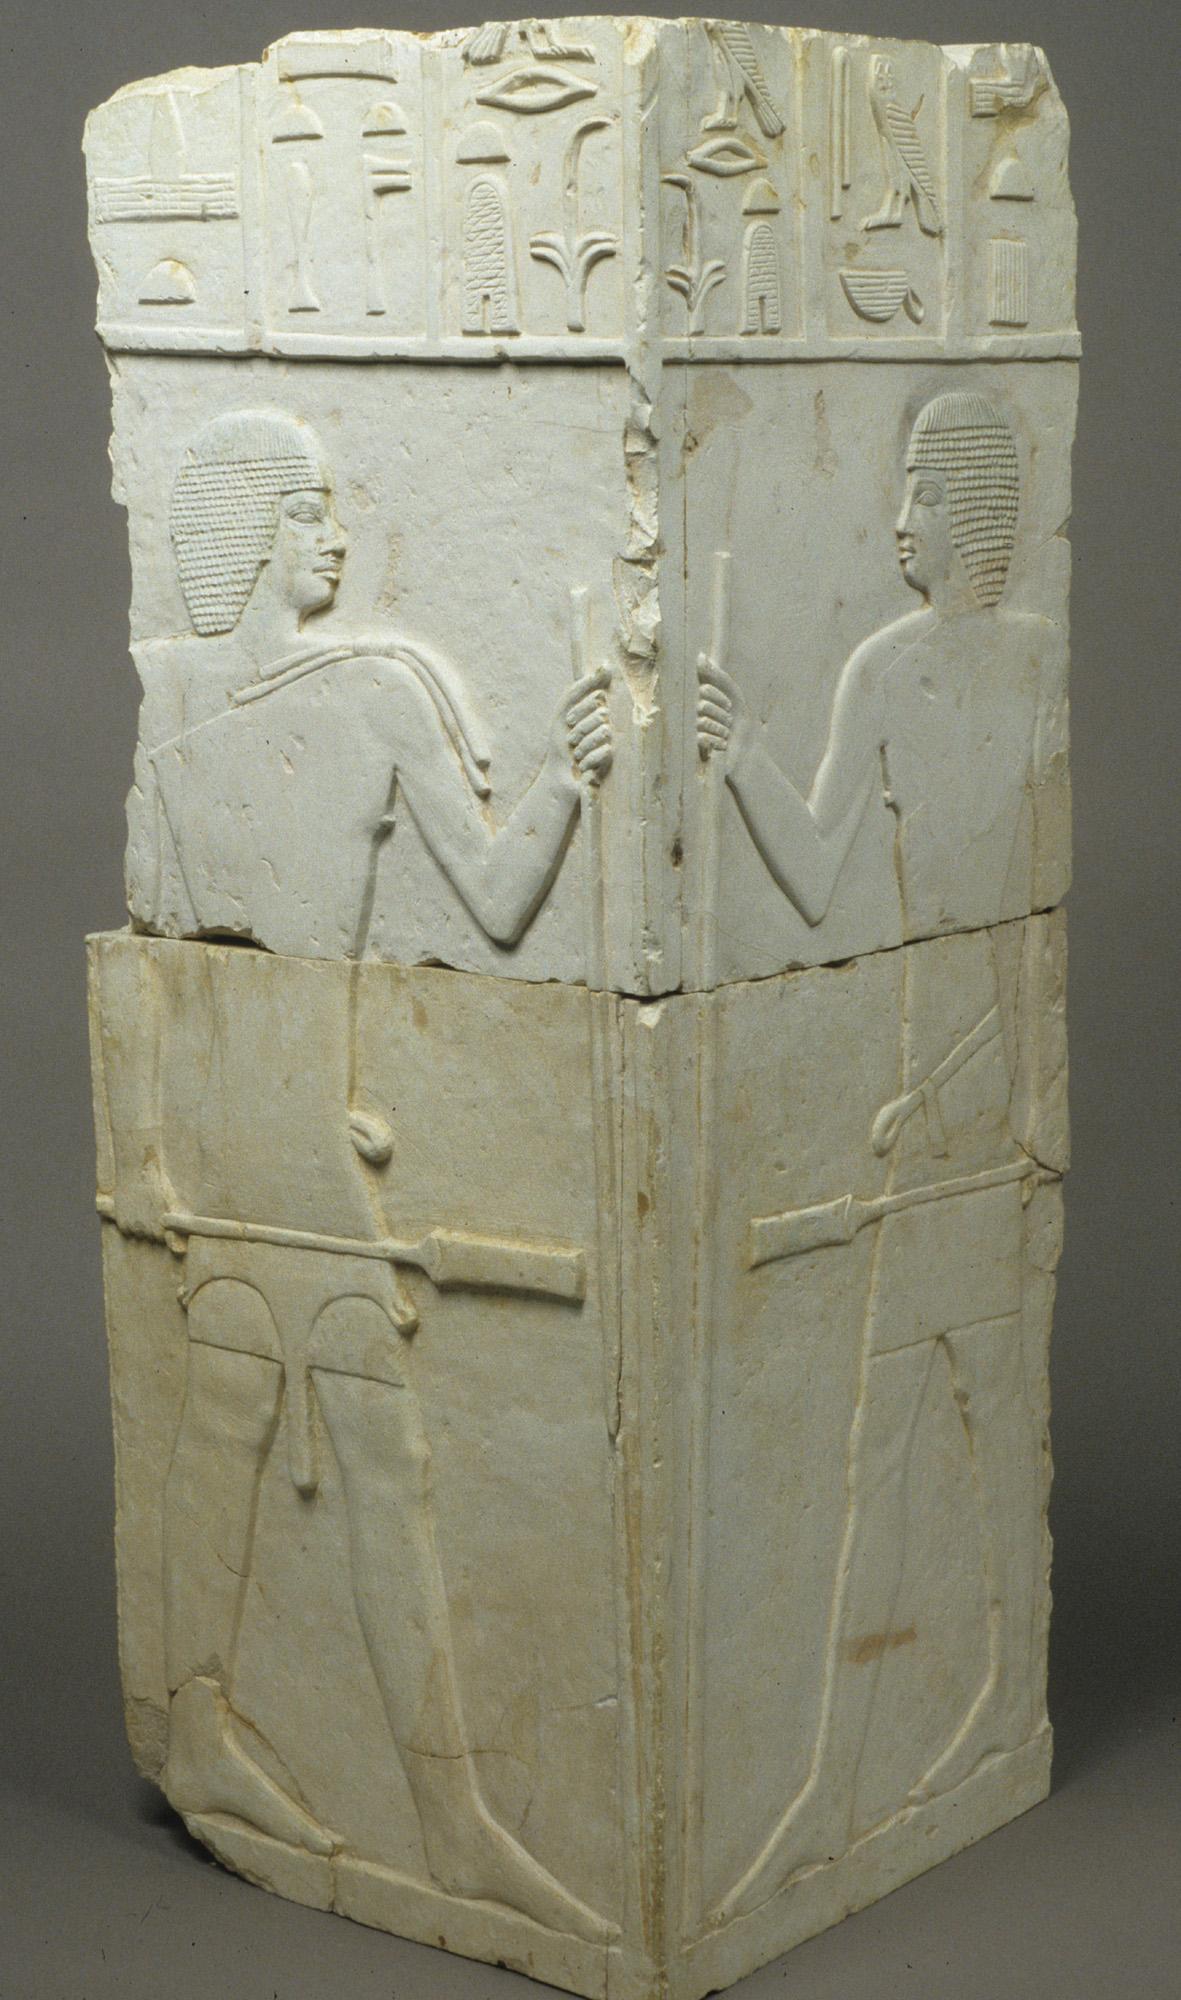 Corner of niche from the tomb of Akhtihotep English: False Door Niche block, Akhtihotep, corner Date English: circa 2575-2551 B.C. Period: